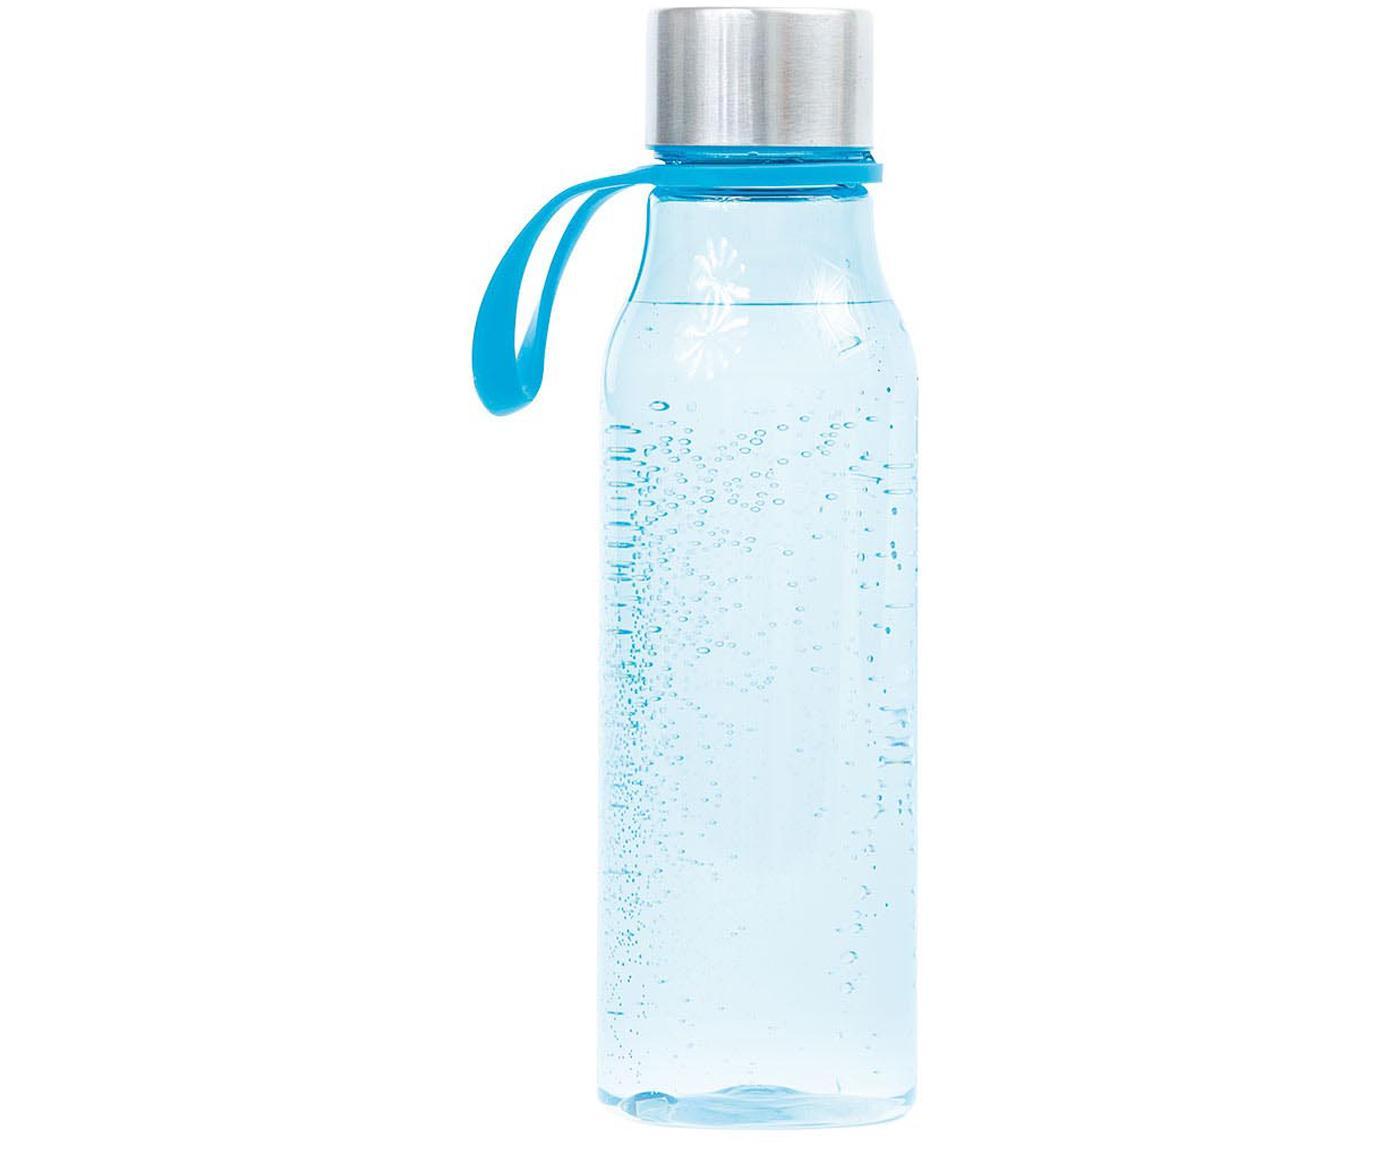 Kleine to go drinkfles Lean, Fles: Tritan (kunststof), BPA-v, Lichtblauw, staalkleurig, 570 ml